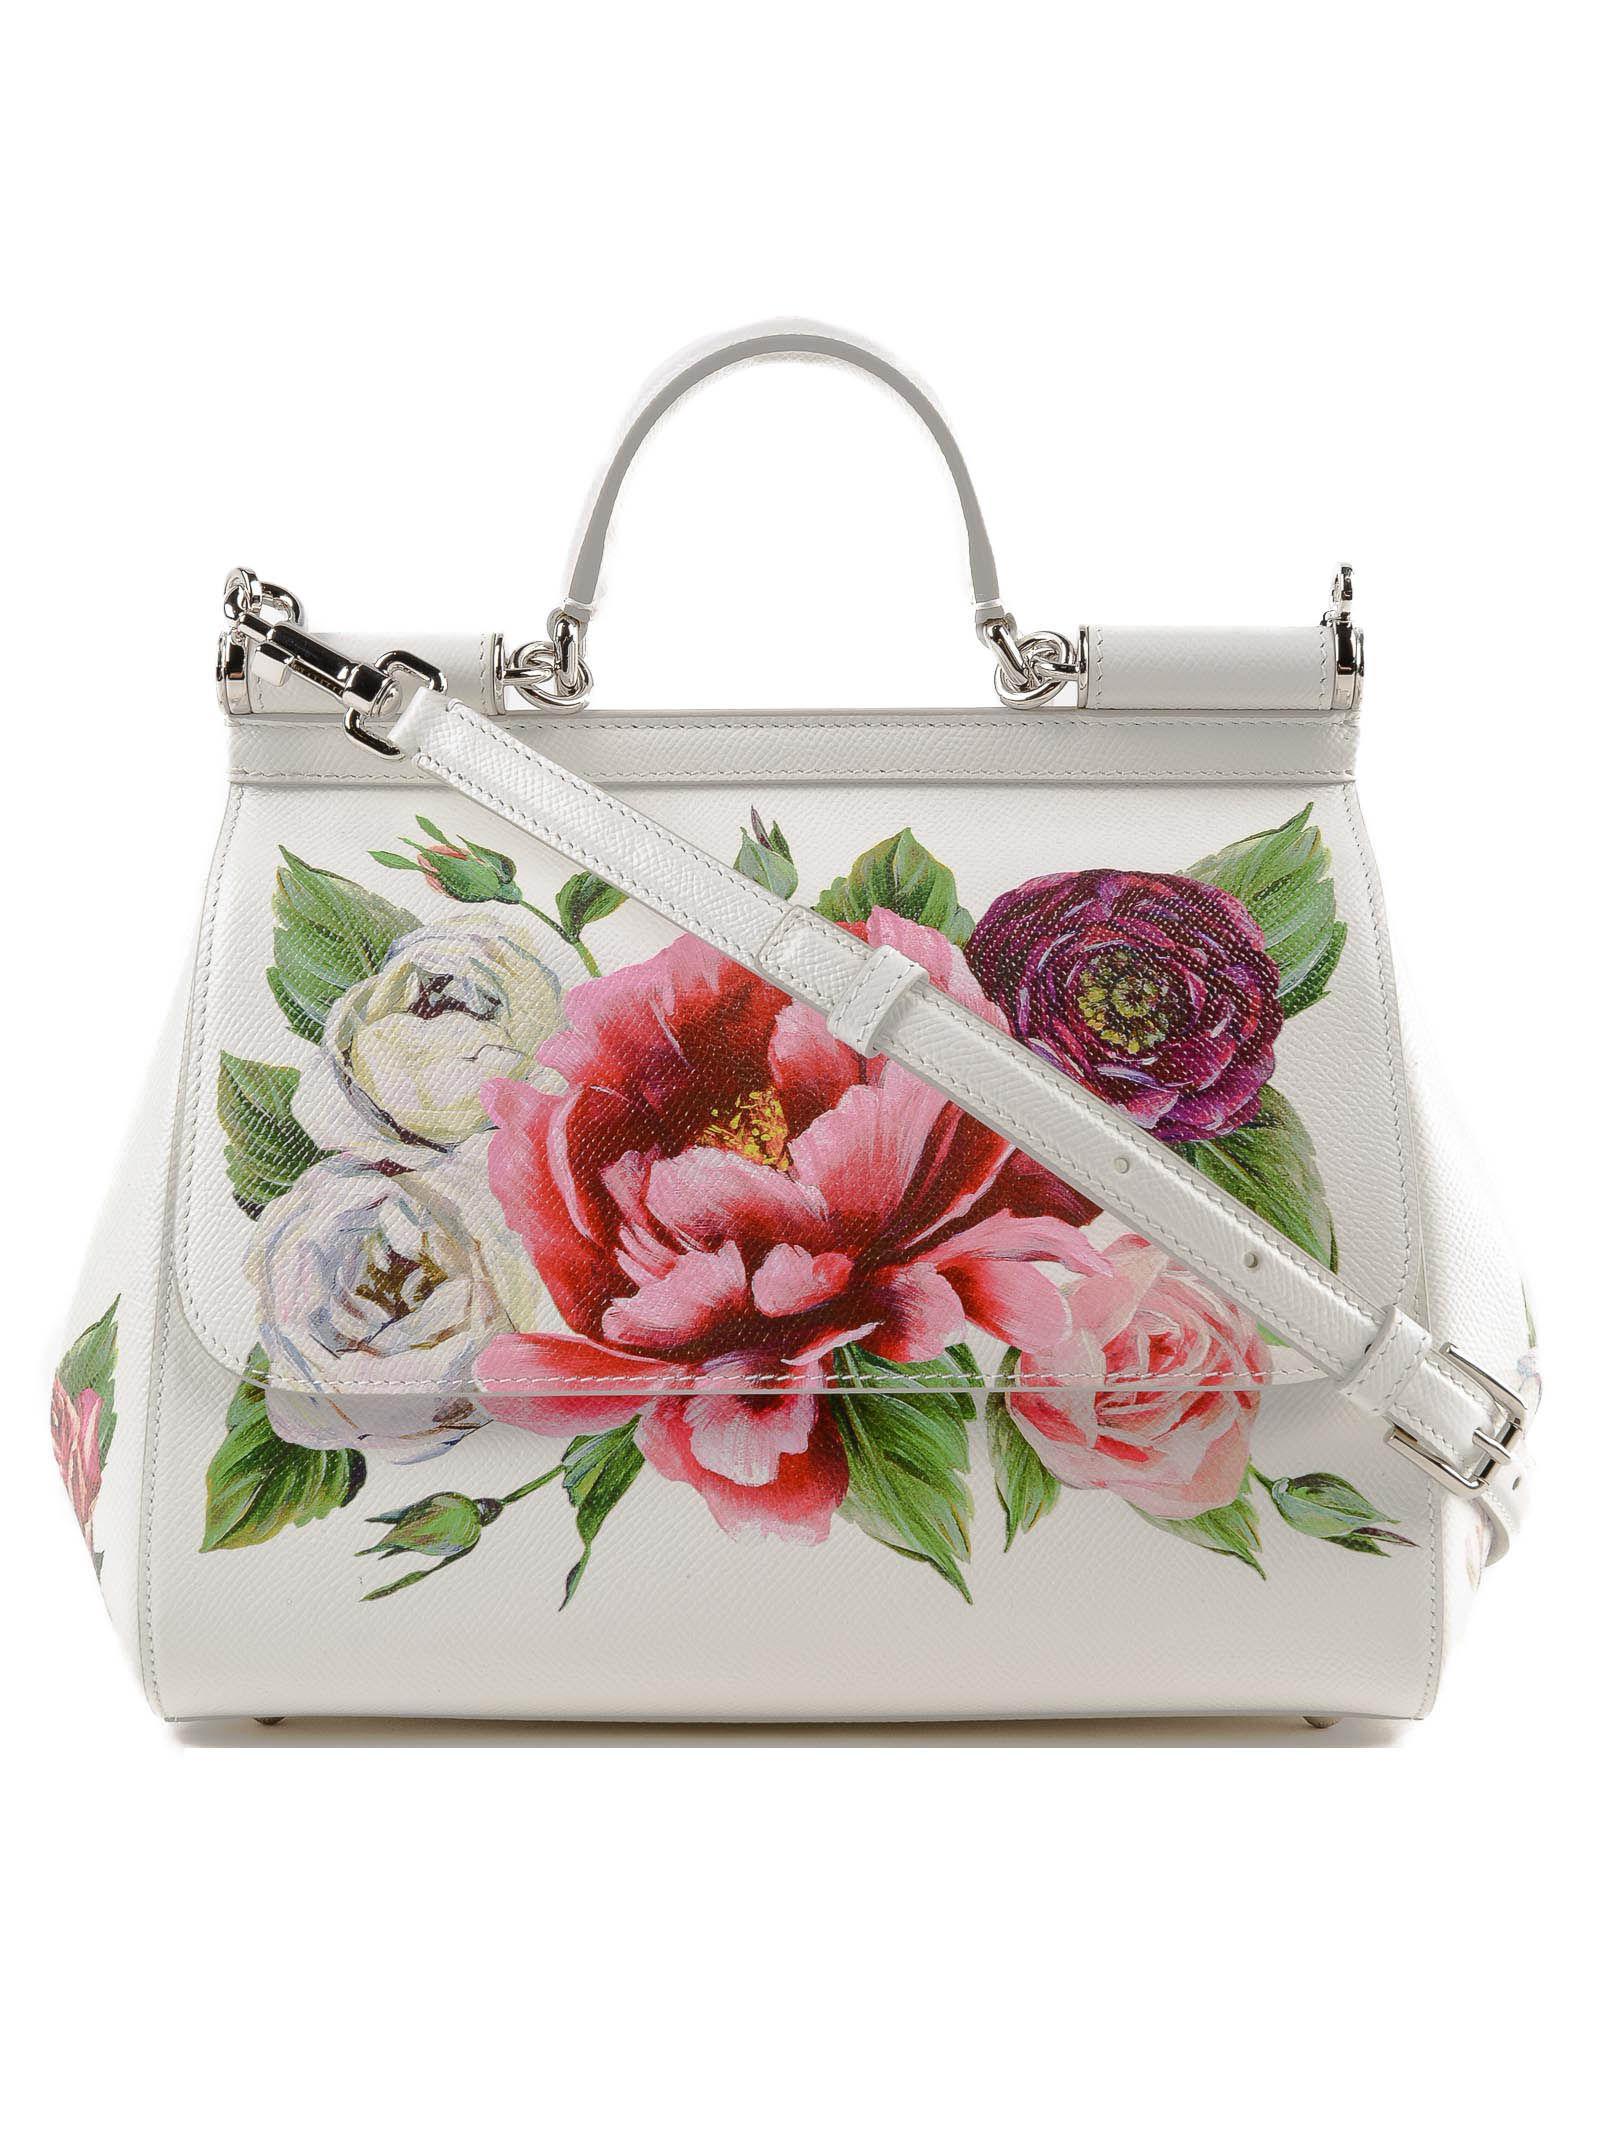 84862de8a2 Lyst - Dolce   Gabbana St.dauphine Printed Handbag